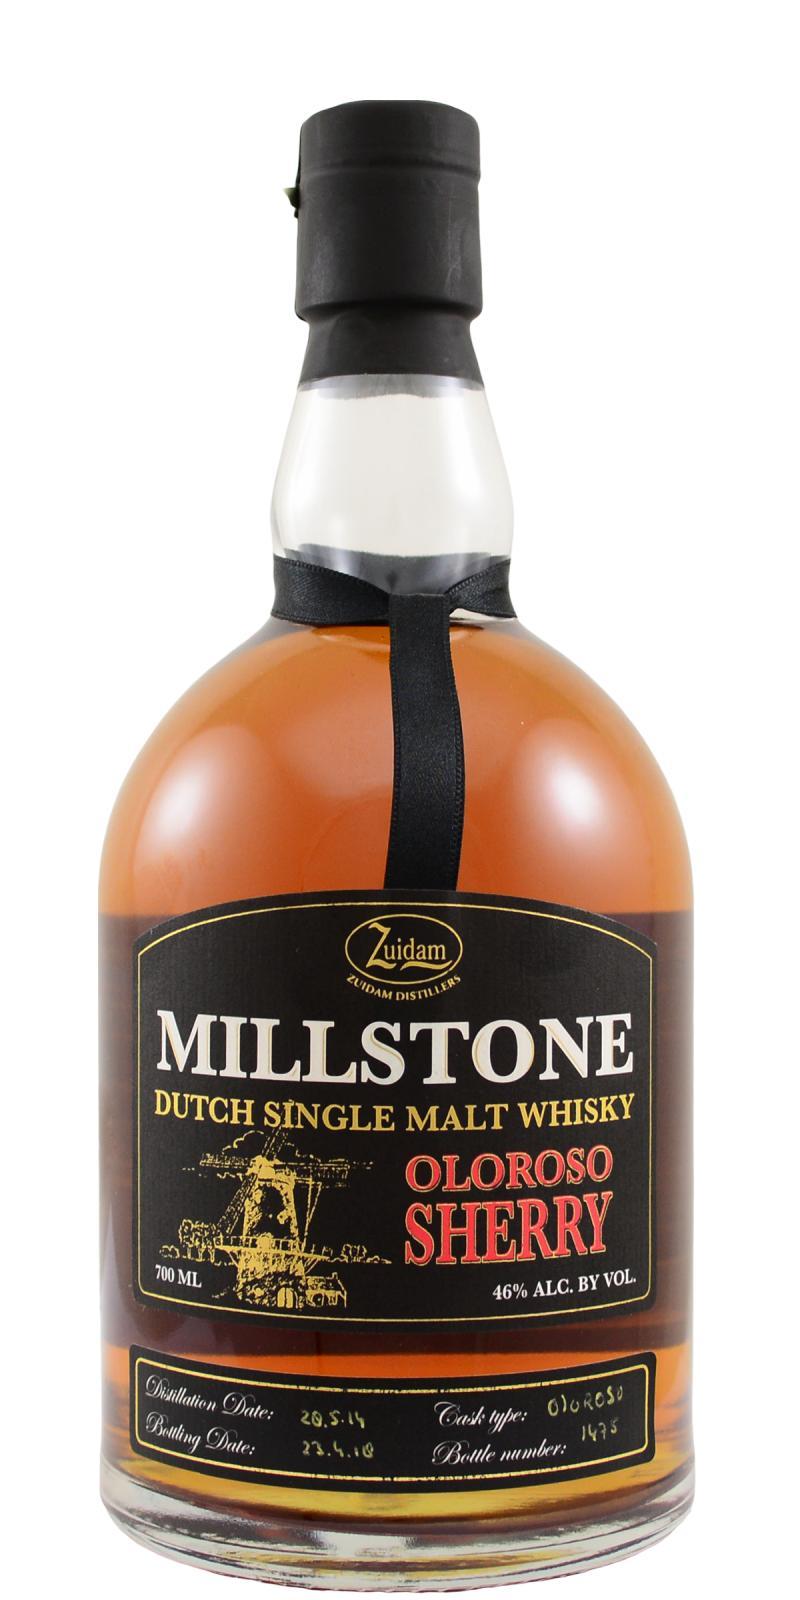 Millstone 2014